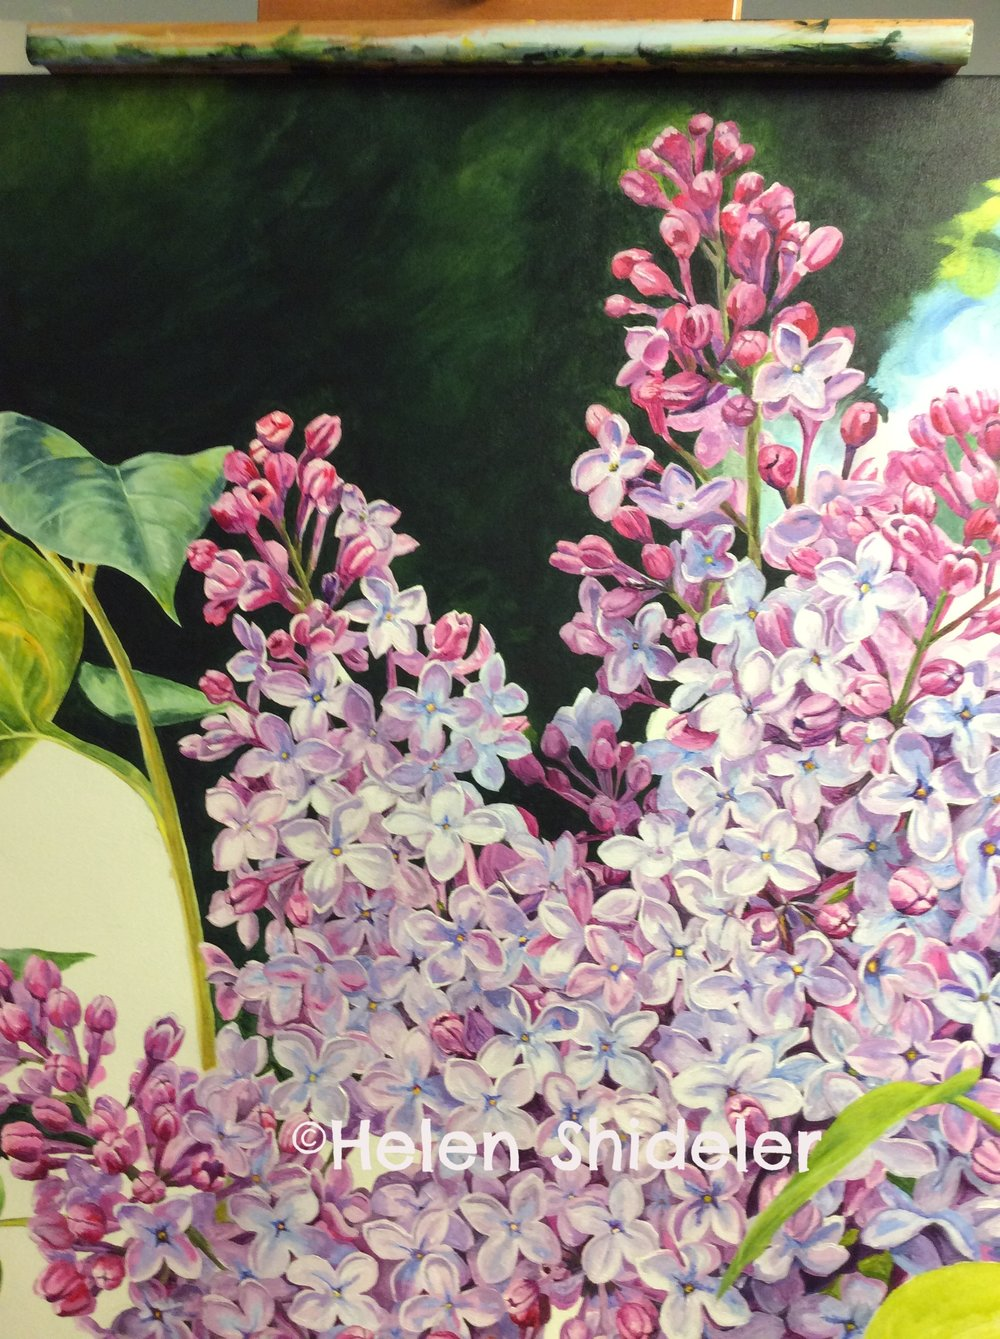 Spring Scentsation WIP by Helen Shideler